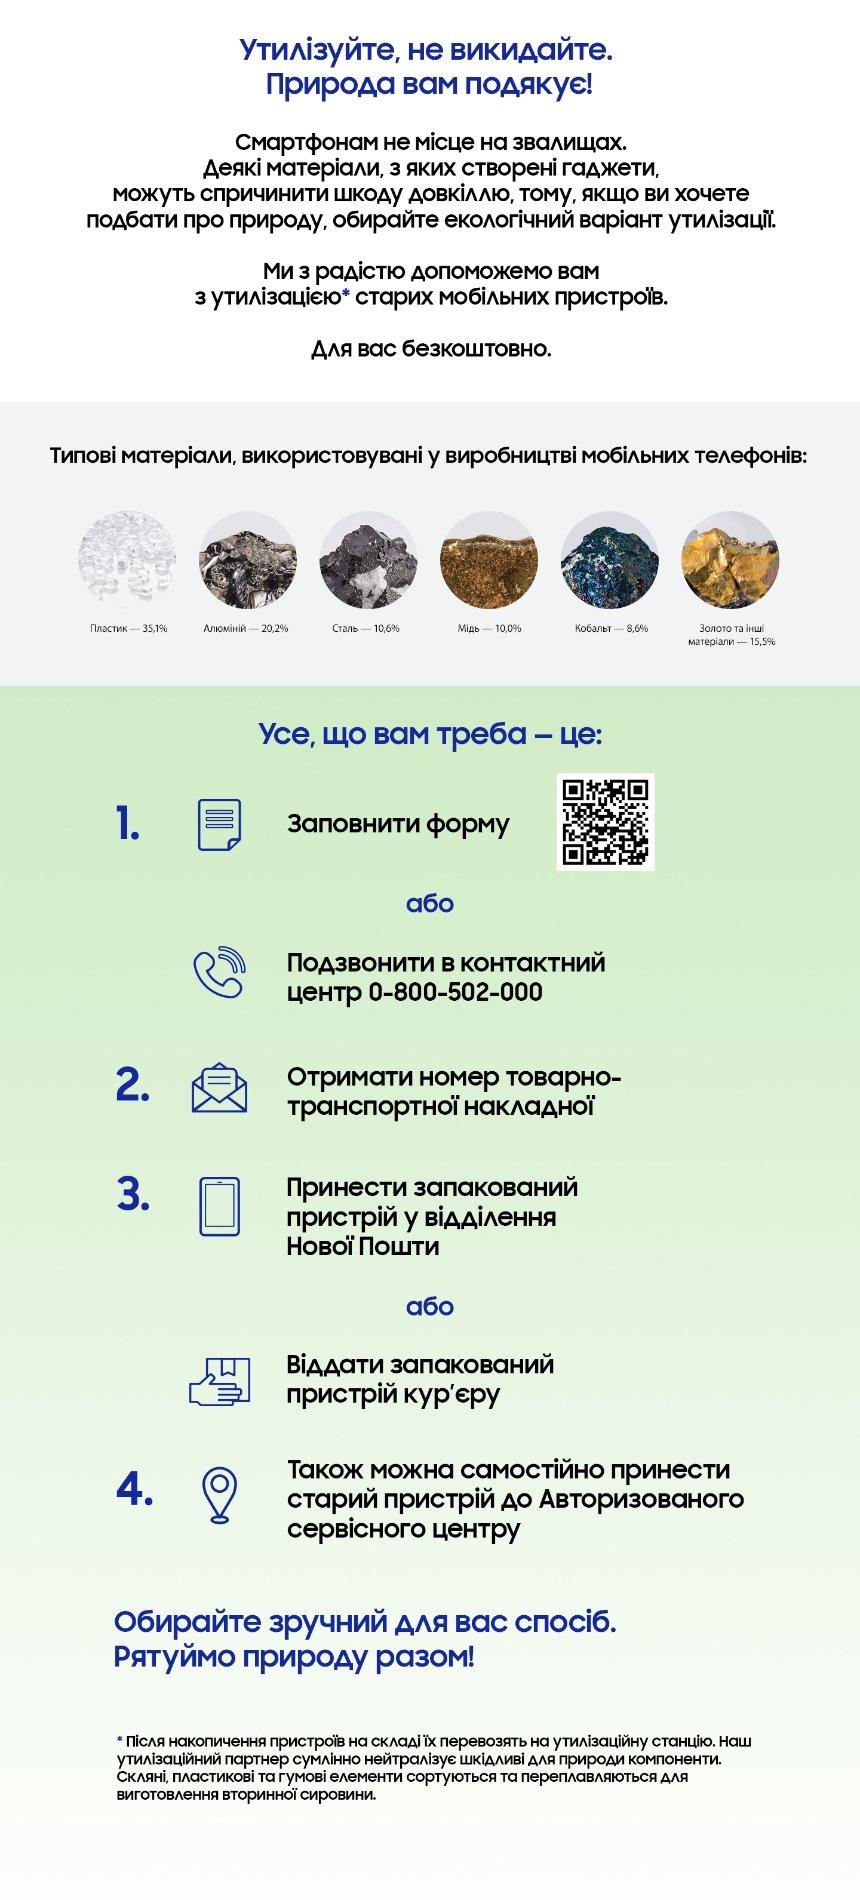 Фото: news.samsung.com